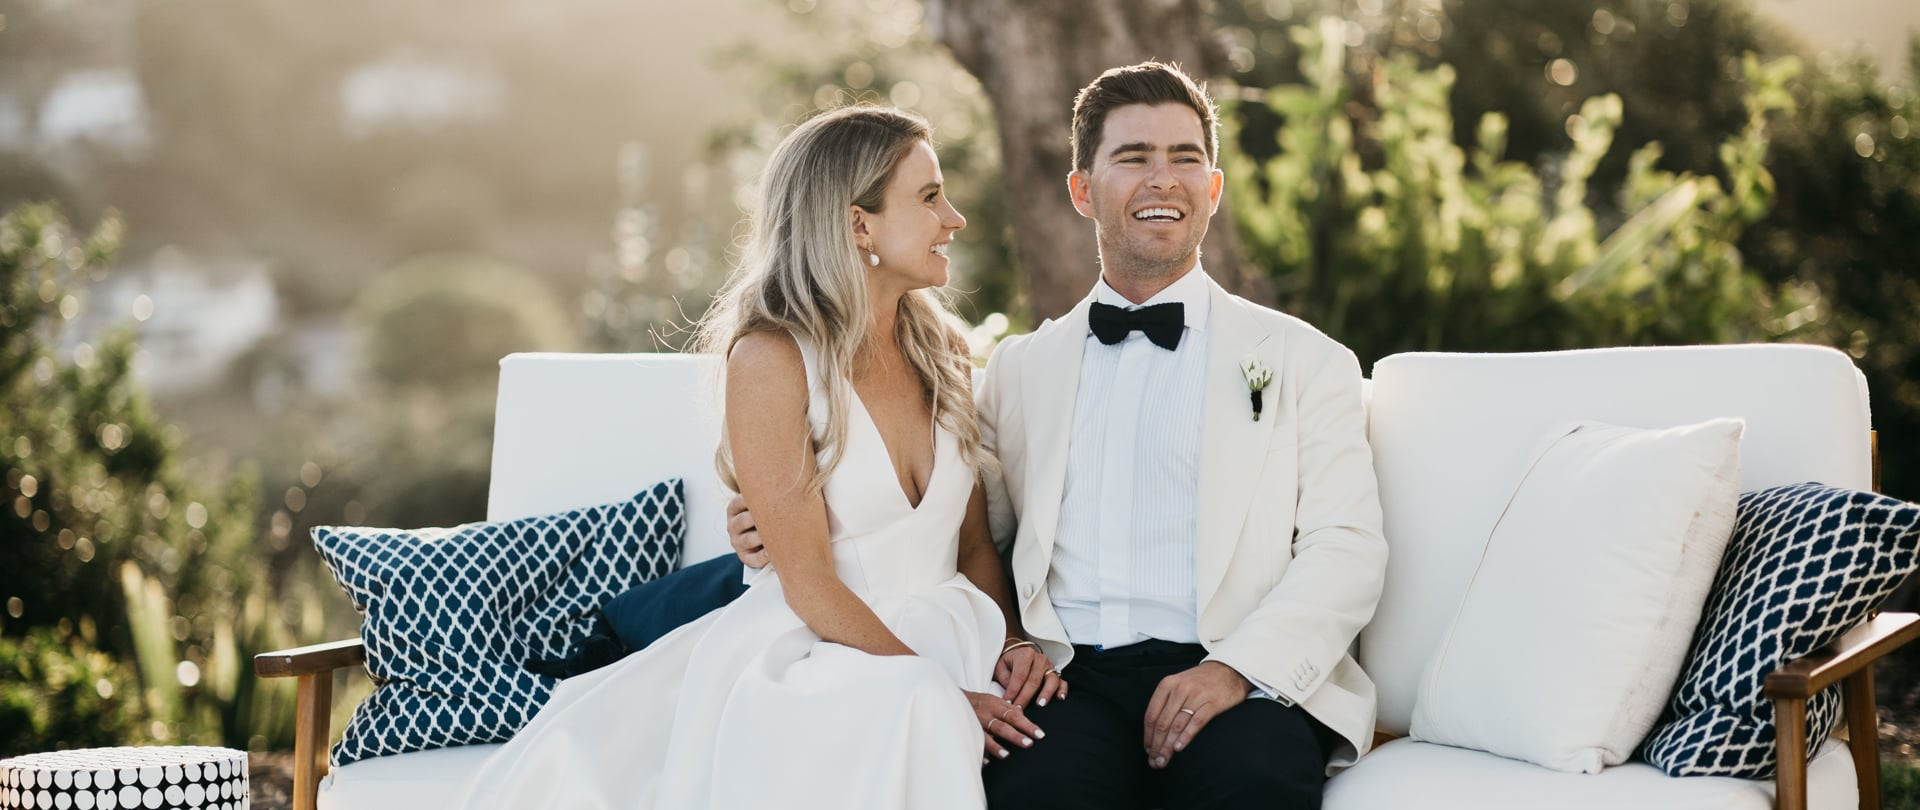 Charlotte & Nick Wedding Video Filmed at Waiheke Island, New Zealand